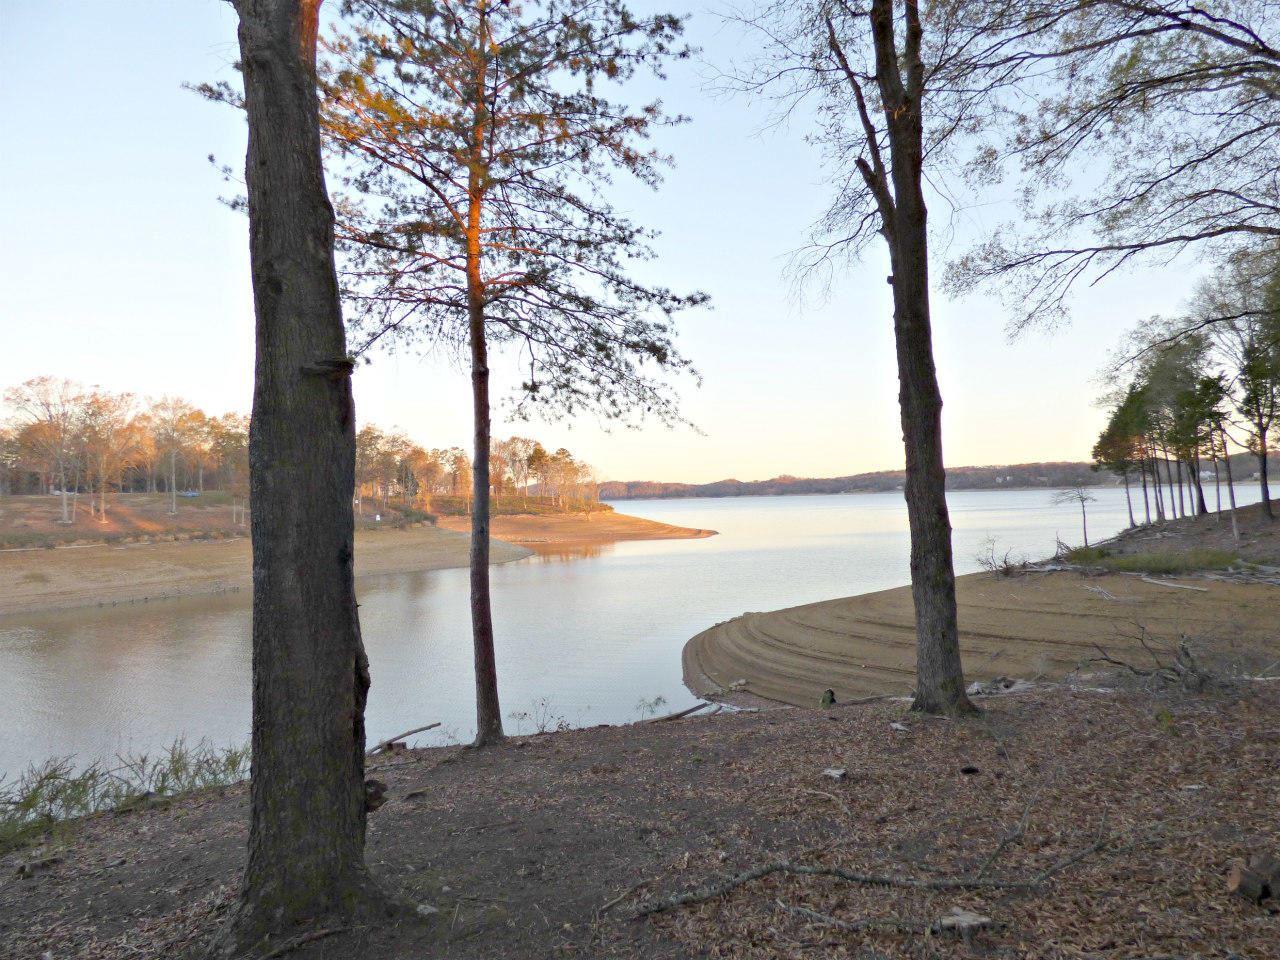 Photo for Lot 126 Ridge Point Tr, Dandridge, TN 37725 (MLS # 1136108)